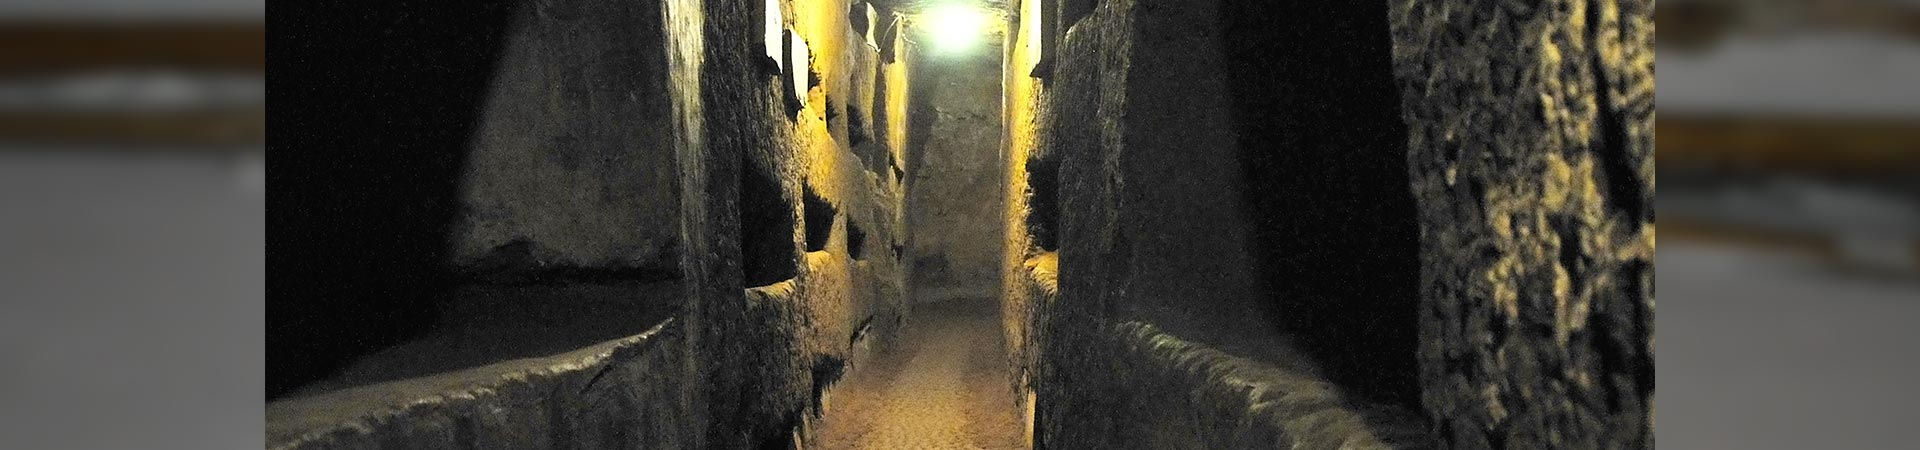 tunnels of santa domitilla catacombs rome